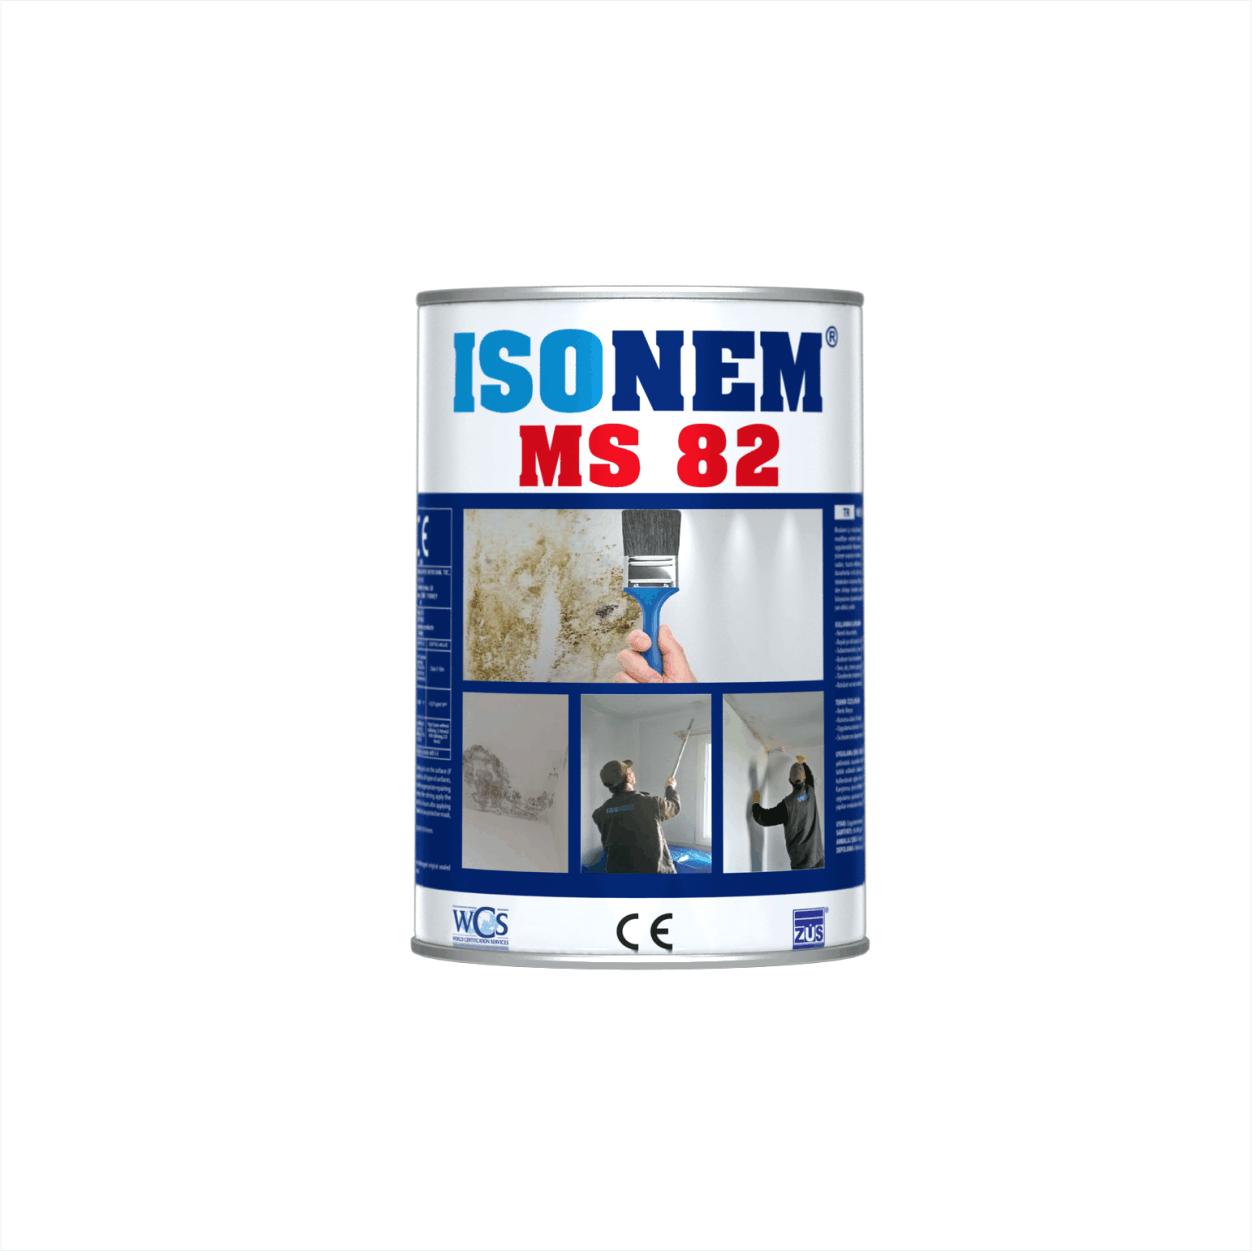 MS 82